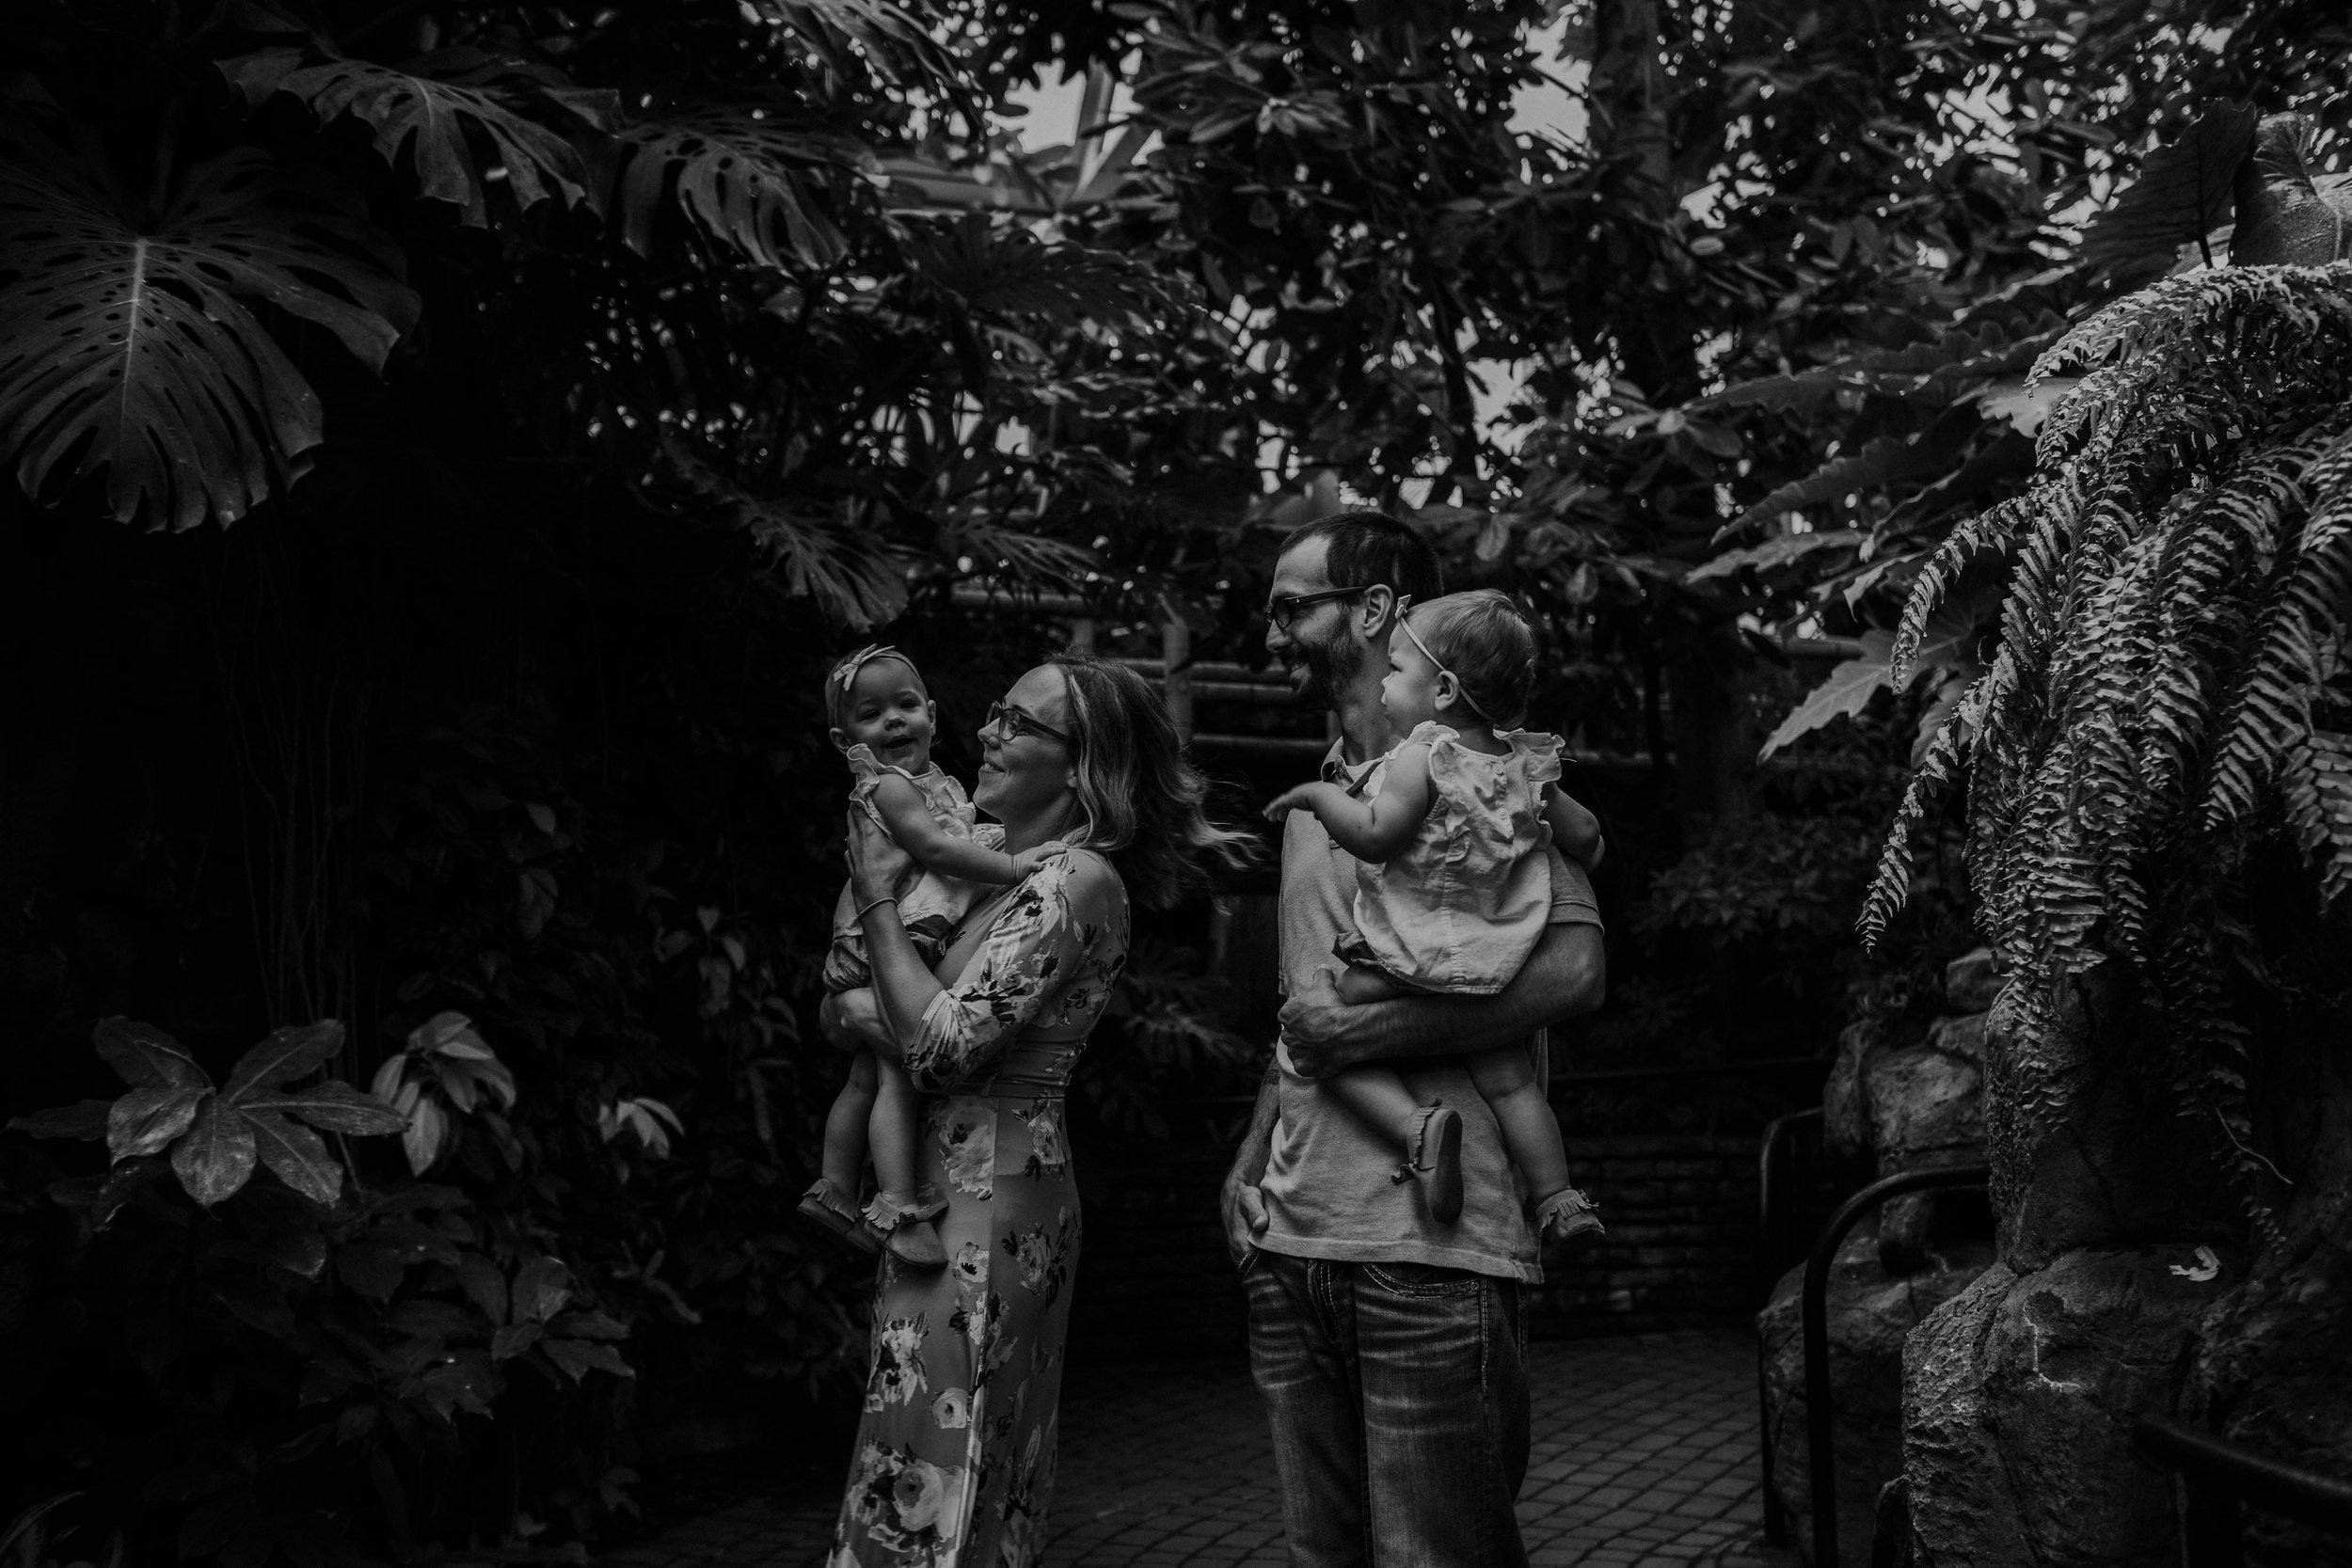 Franklin park conservatory family session grace e jones photography Columbus Ohio